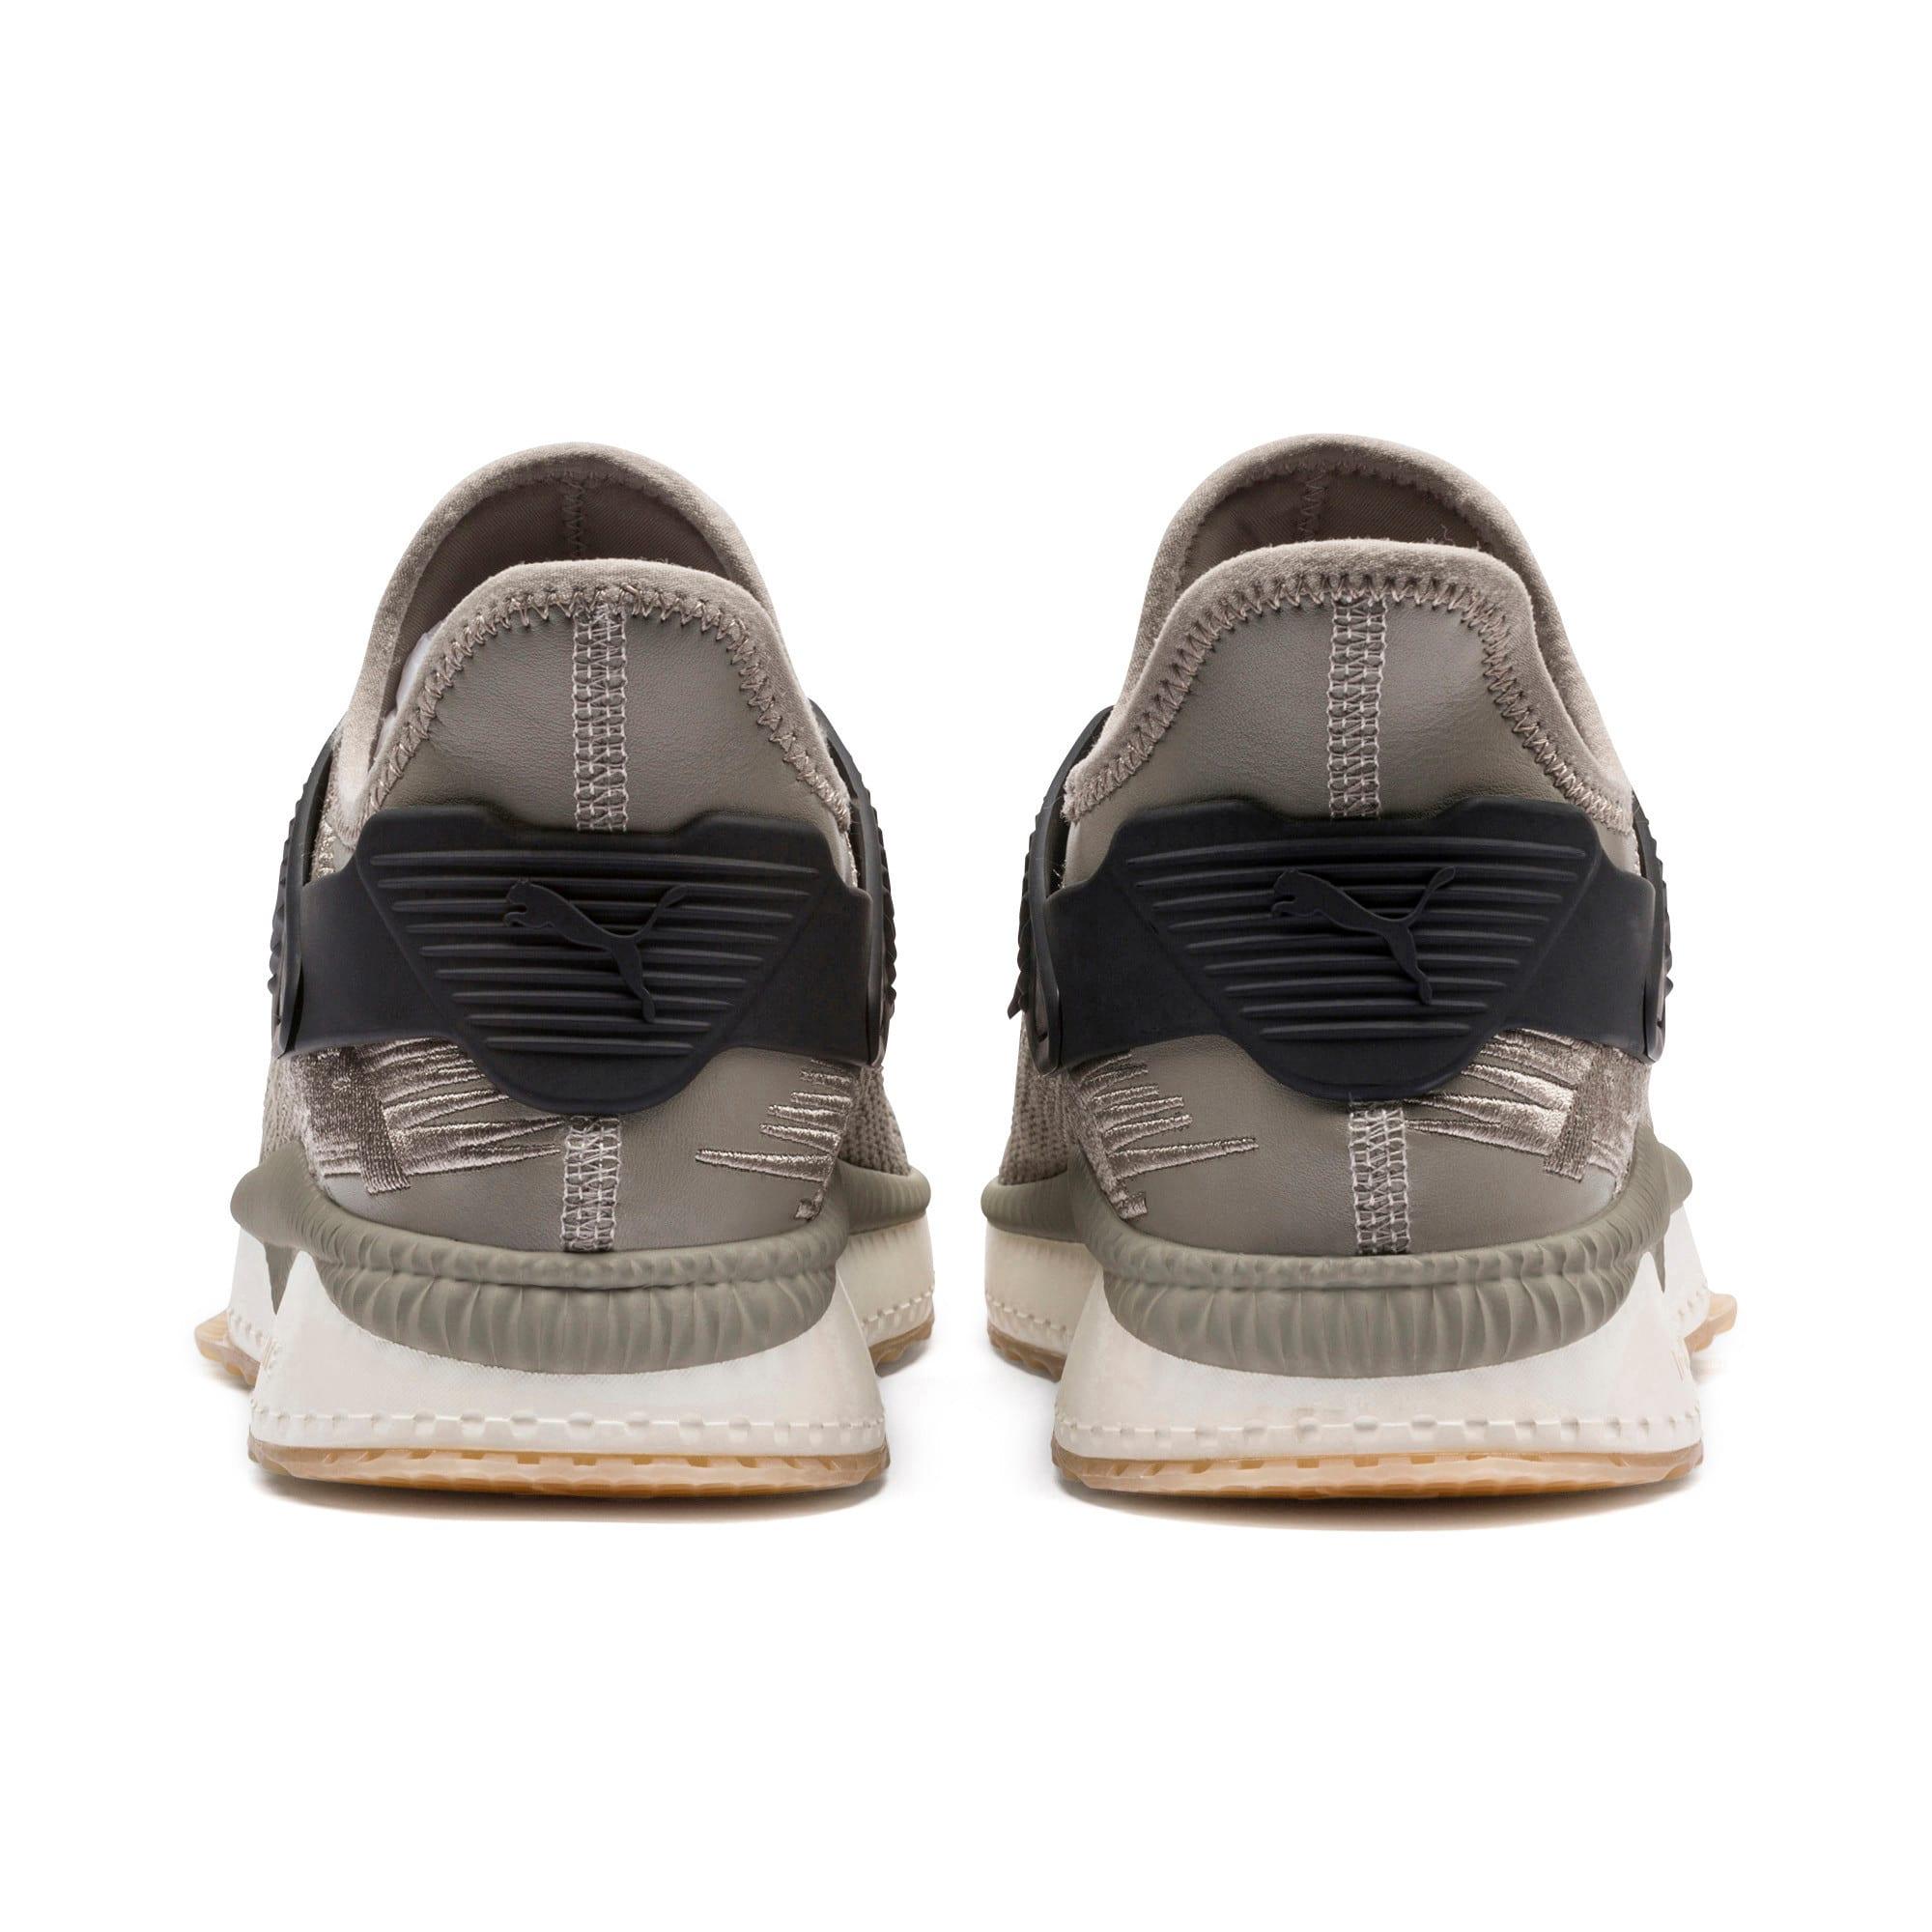 Thumbnail 4 of TSUGI Cage Premium Sneakers, Elephant Skin-Puma Black, medium